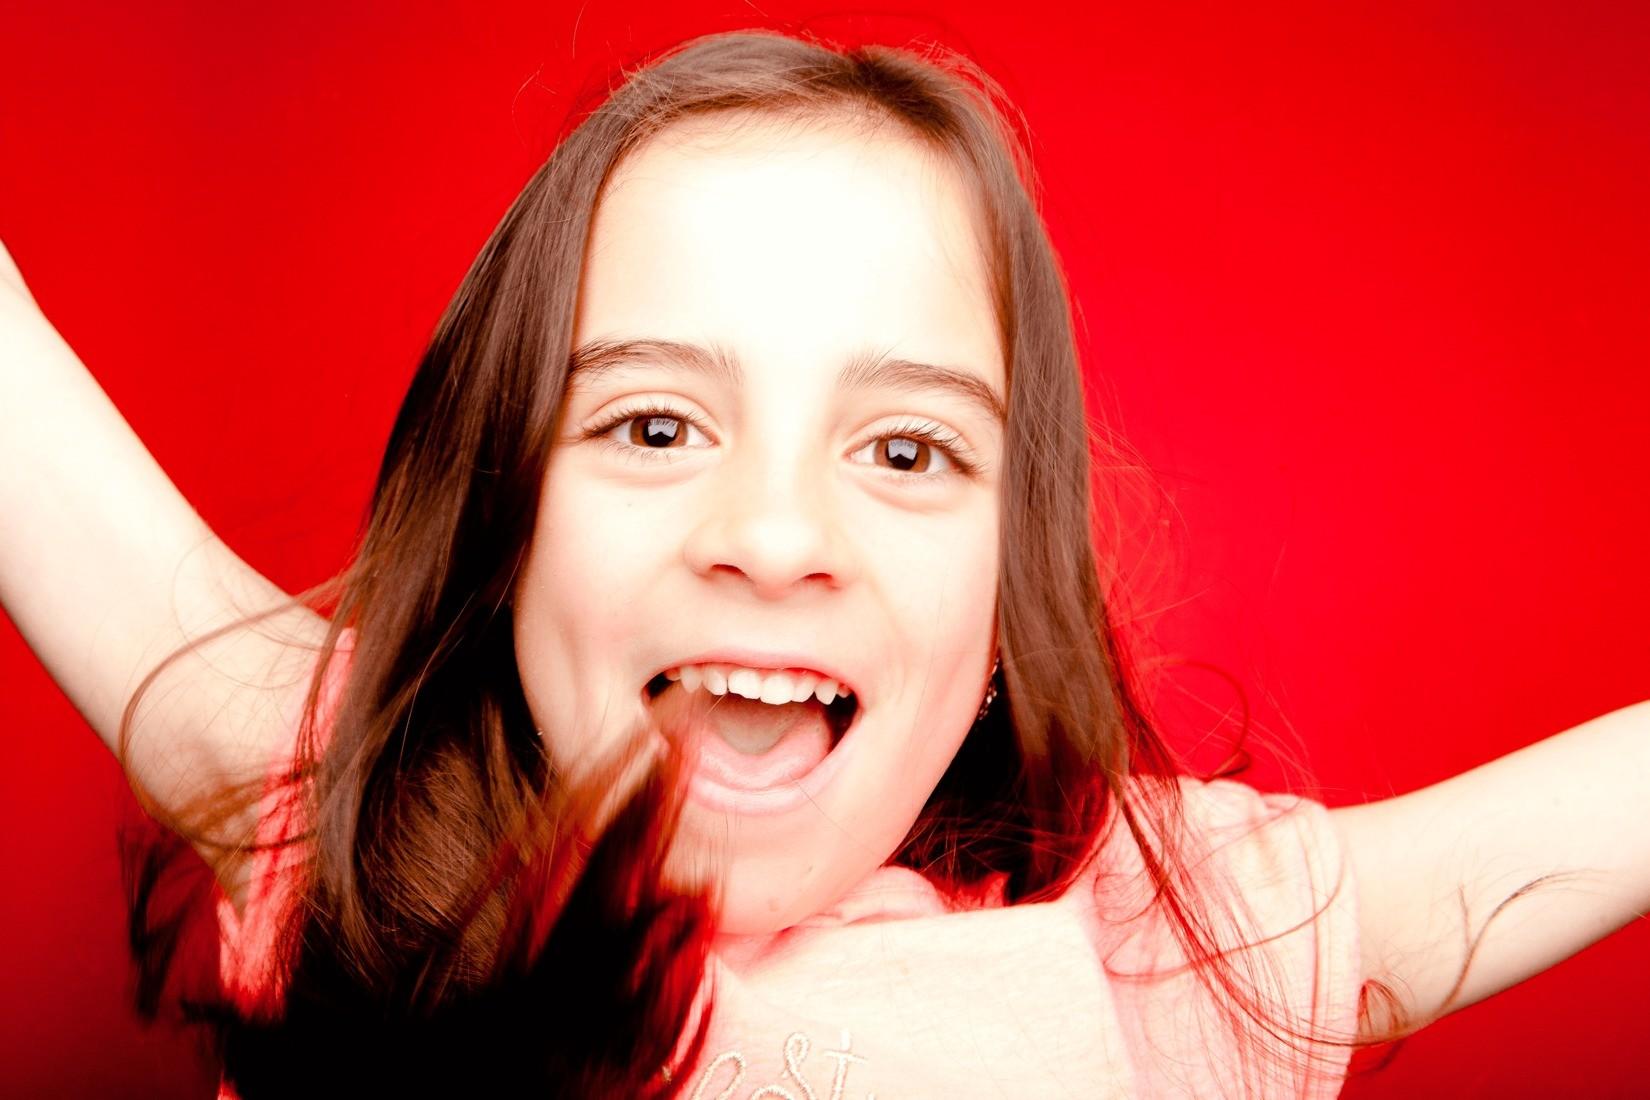 Lucie D